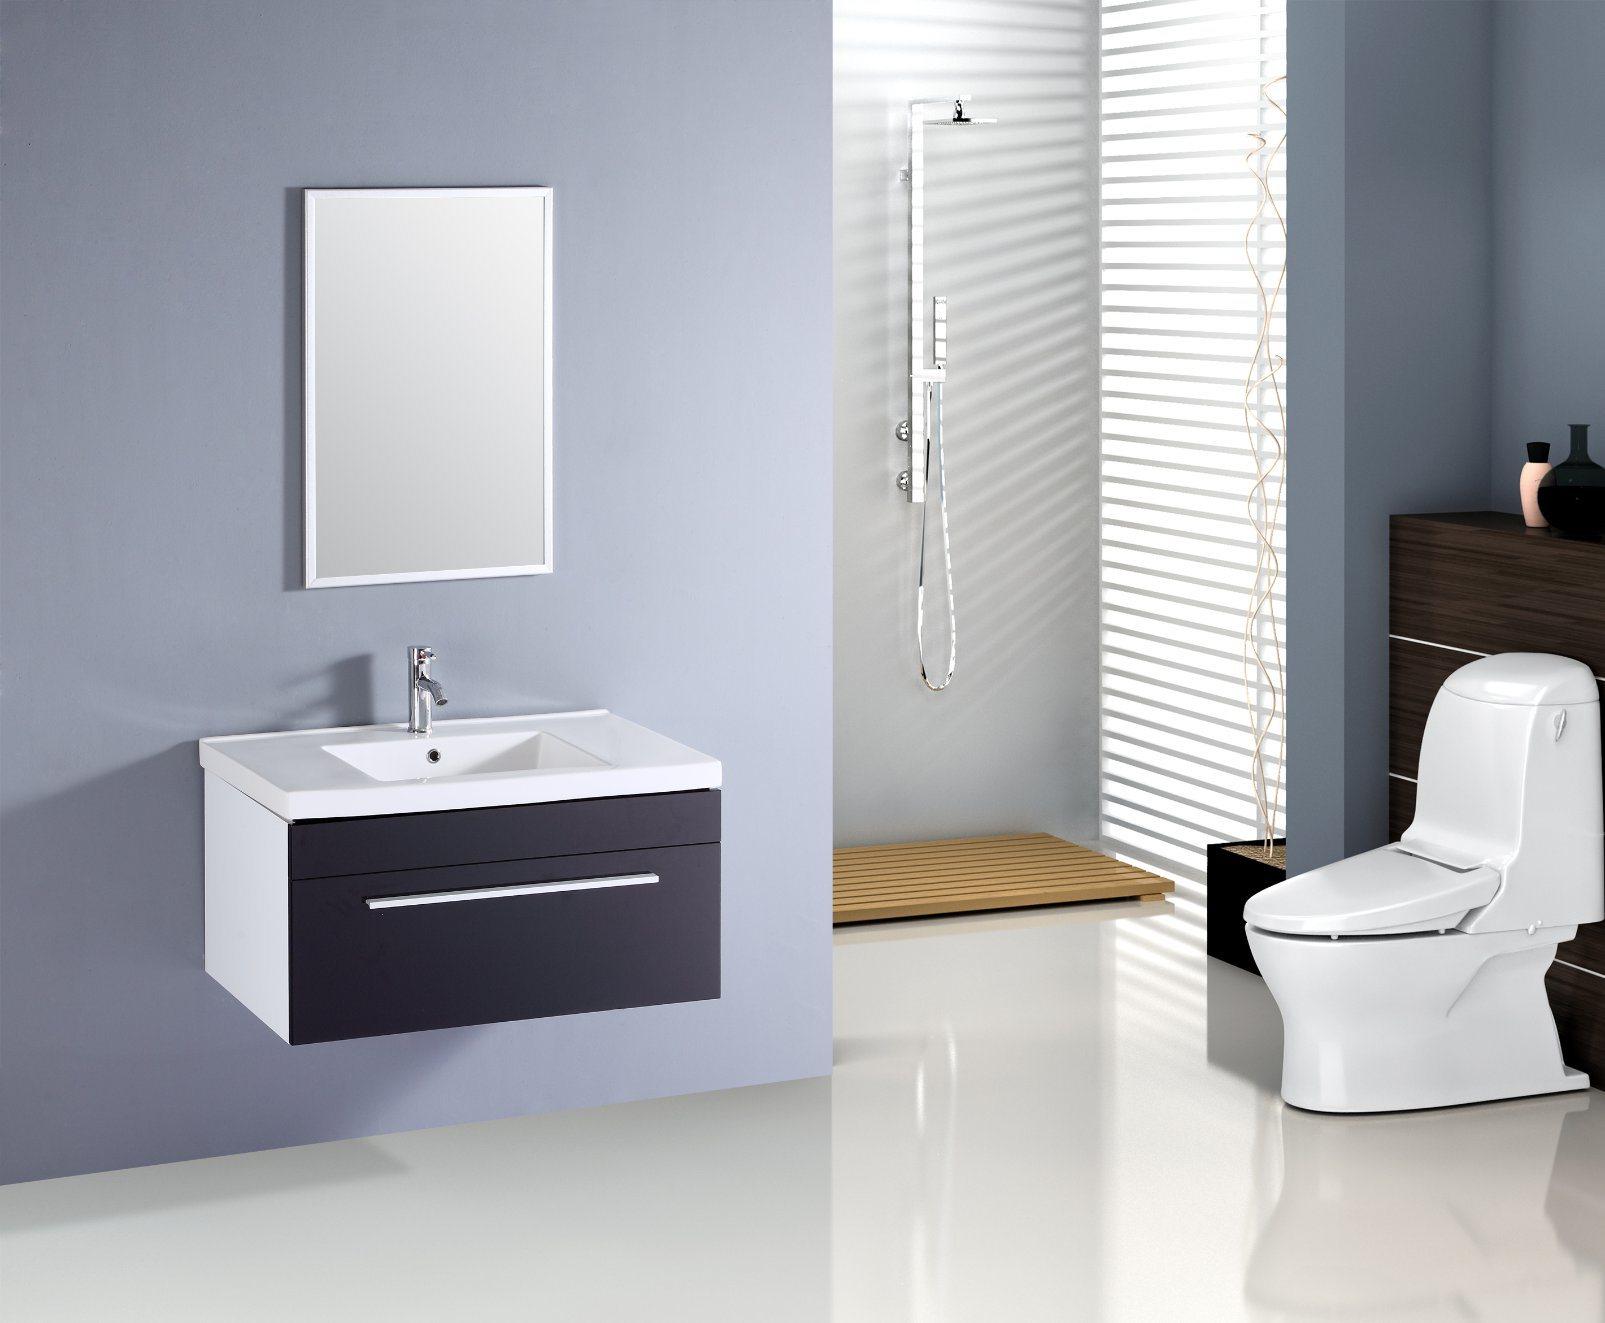 China Modern Furniture Bathroom Basin Cabinet Mdf Sanitary